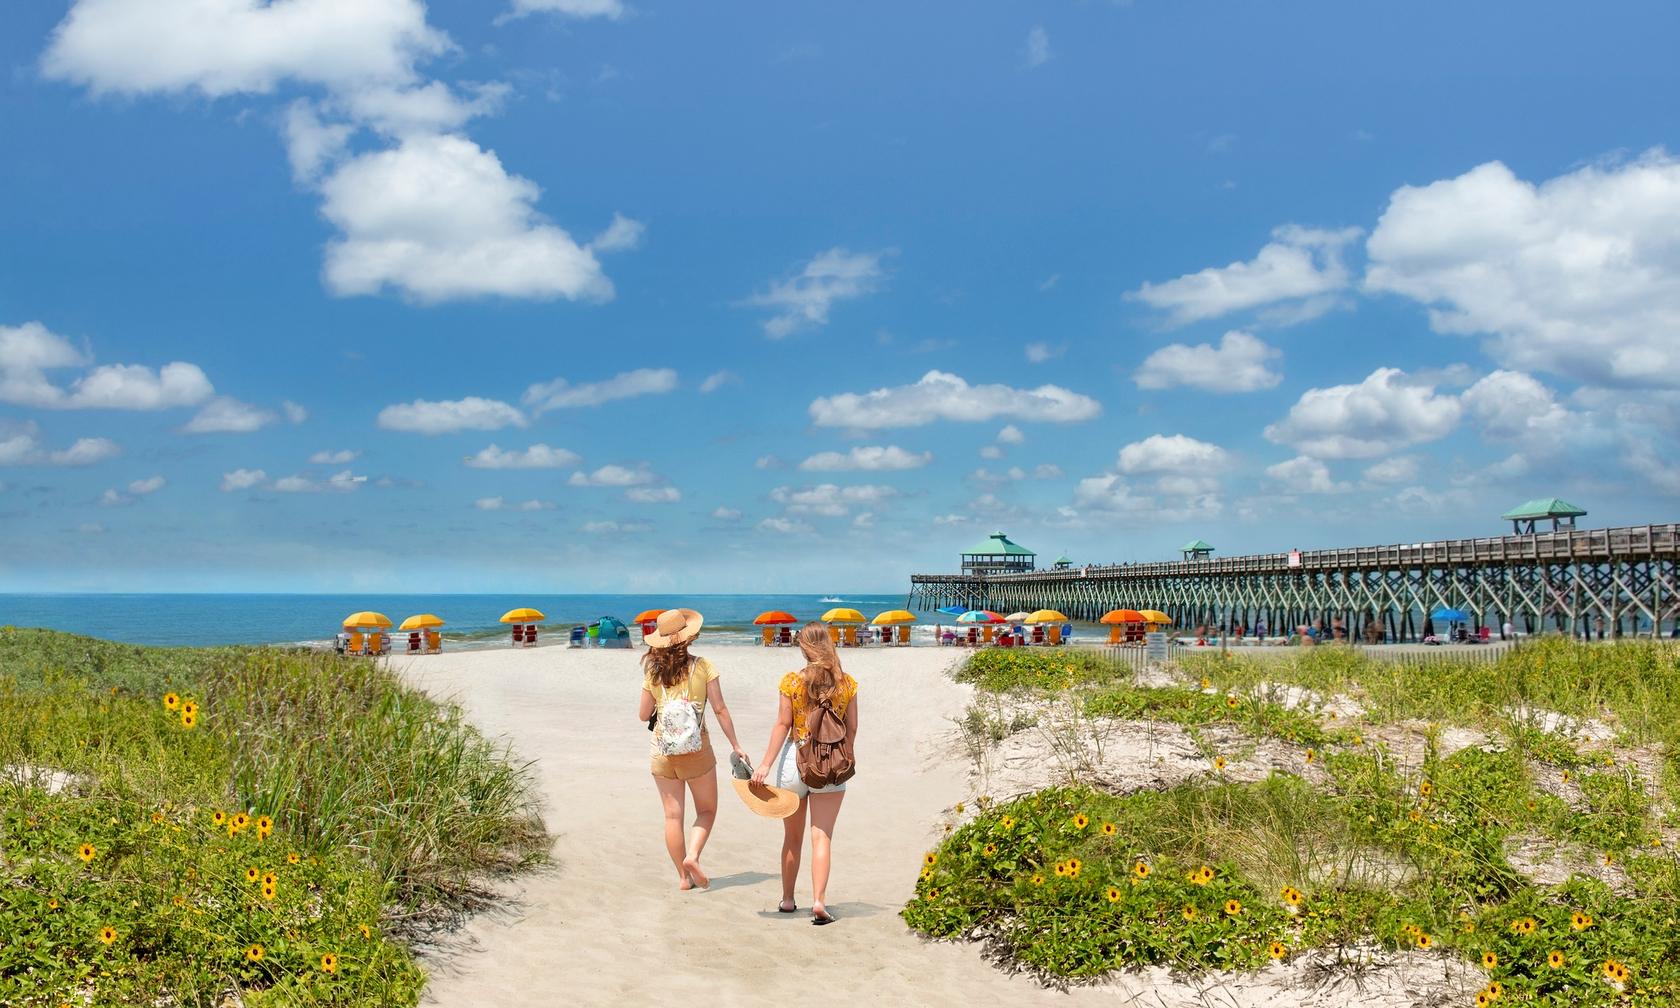 Vacation rental beach houses in Folly Beach